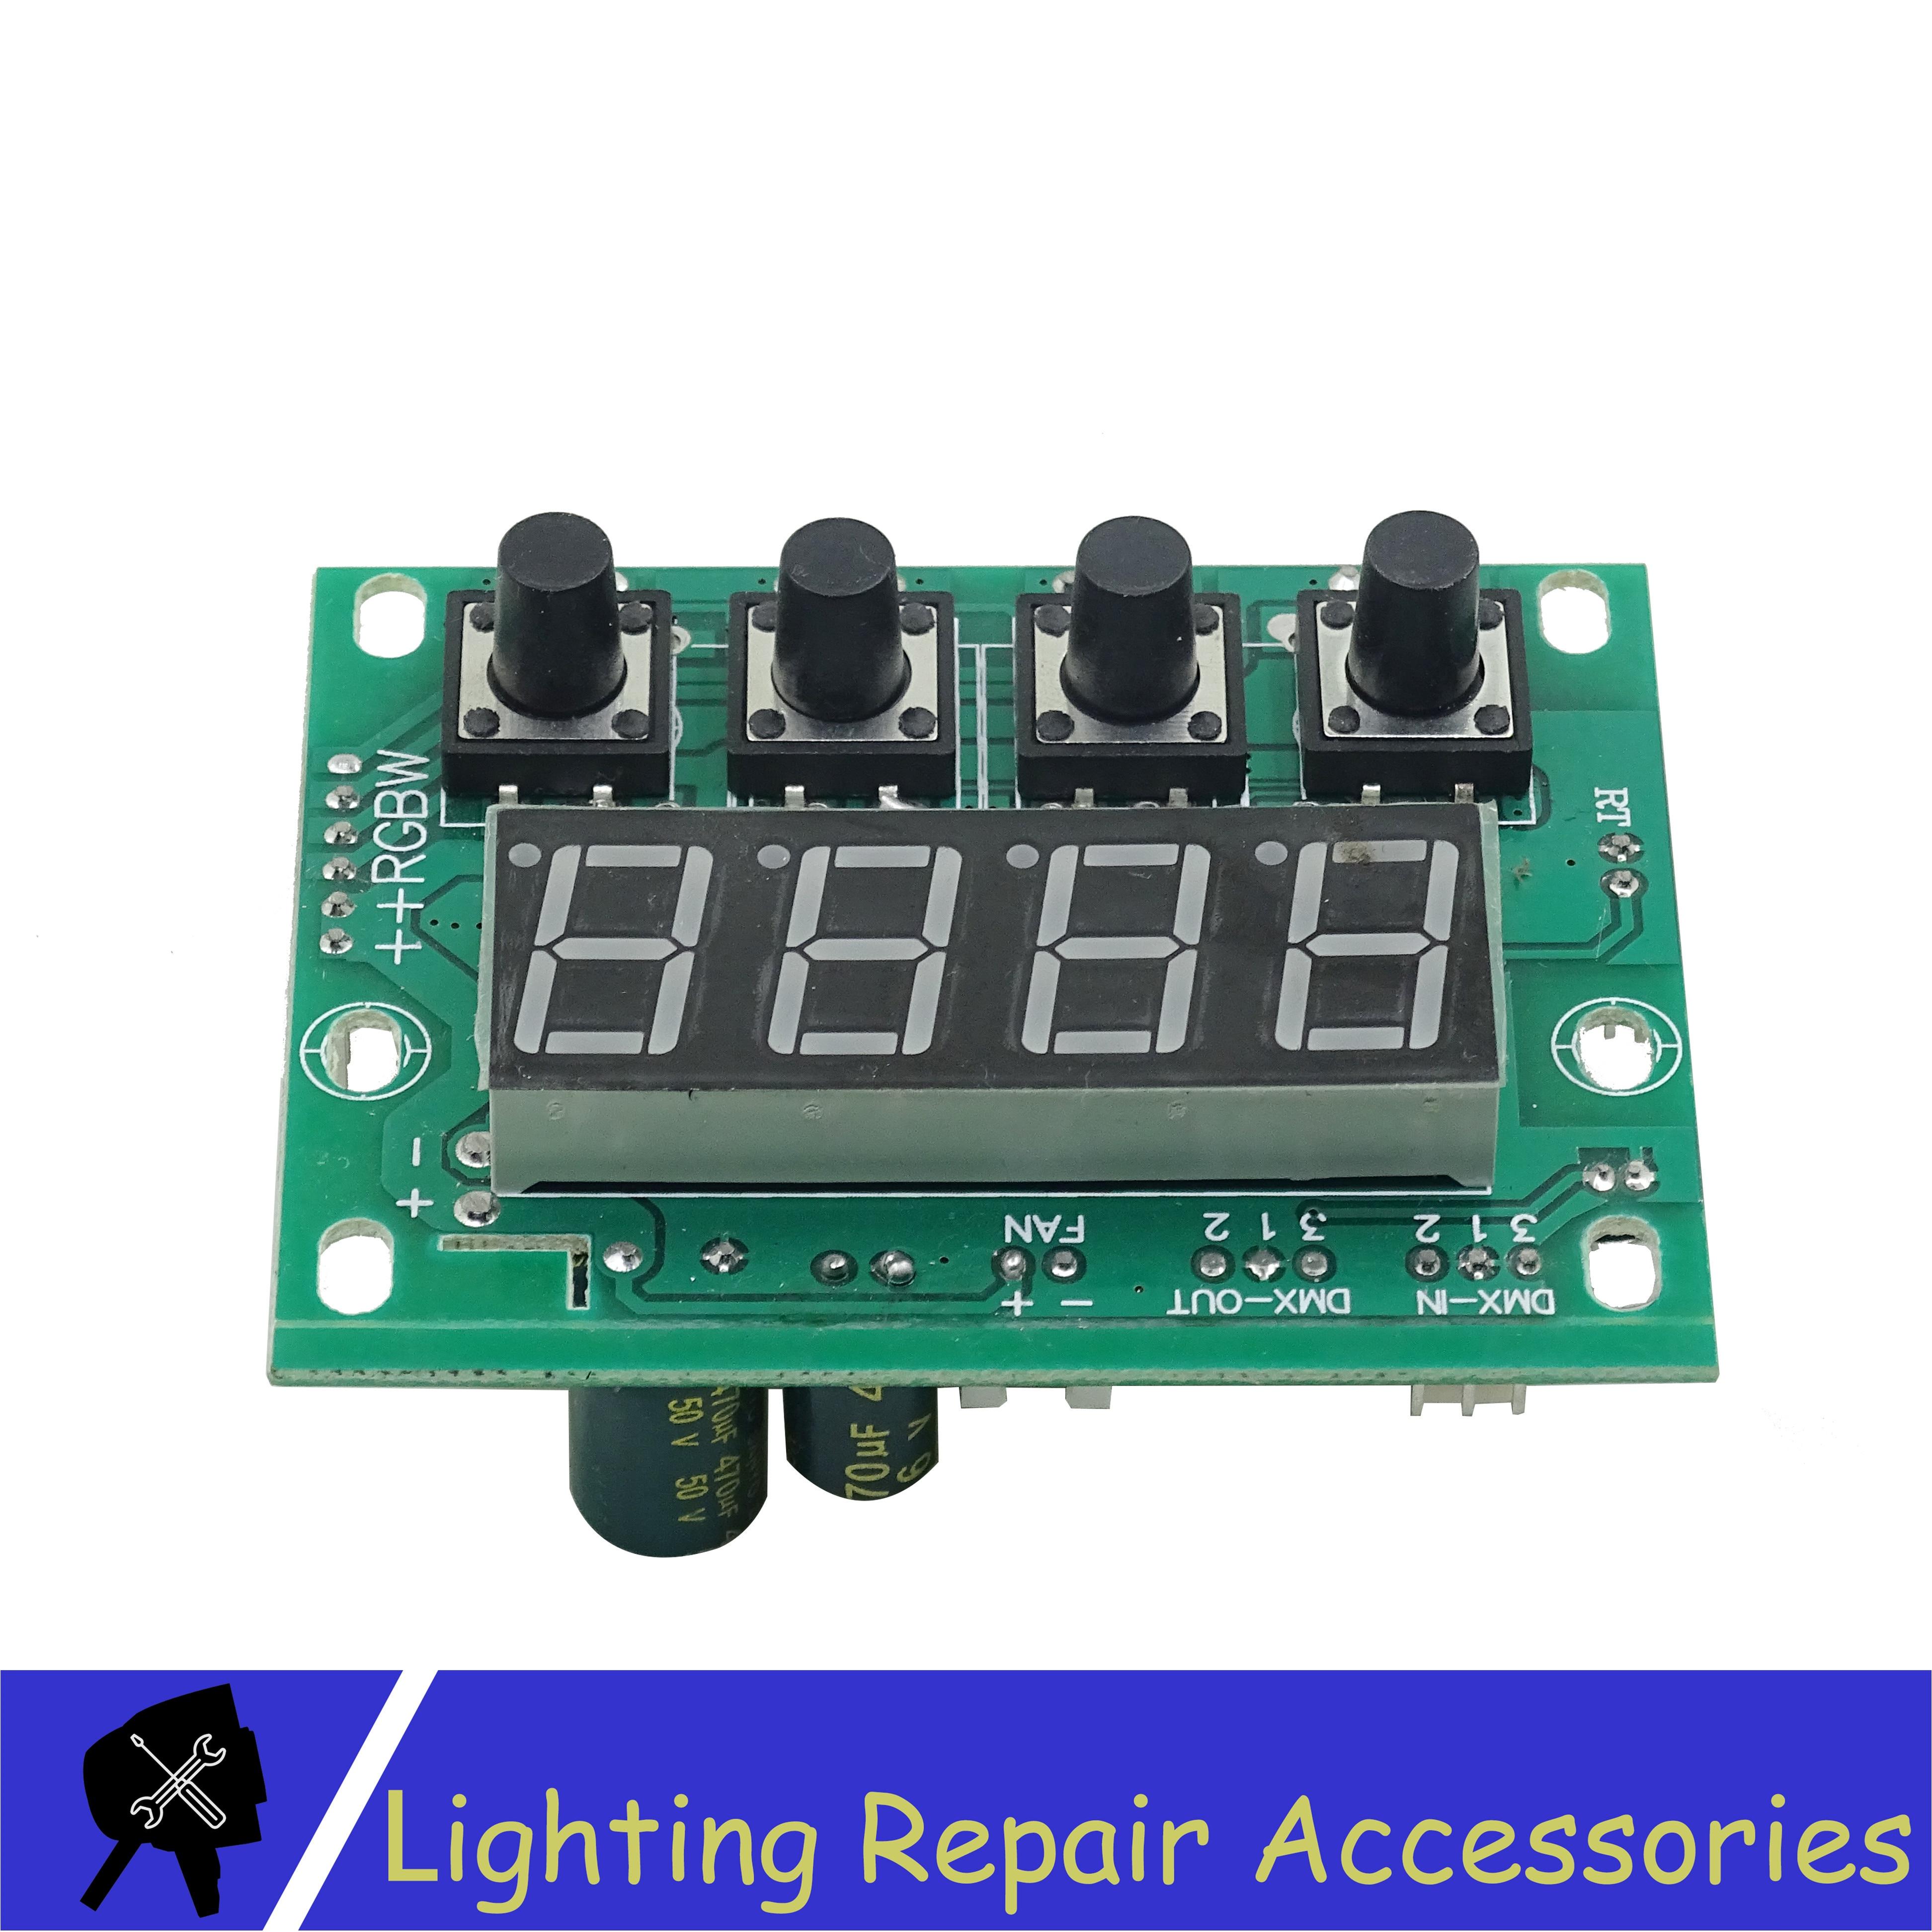 Led Par Light Motherboard For 54x3w 54x9w 24x9w 18x9w RGW 3in1 COB Led Stage Light Waterproof IP65 Or IP33 Repair Spare Parts